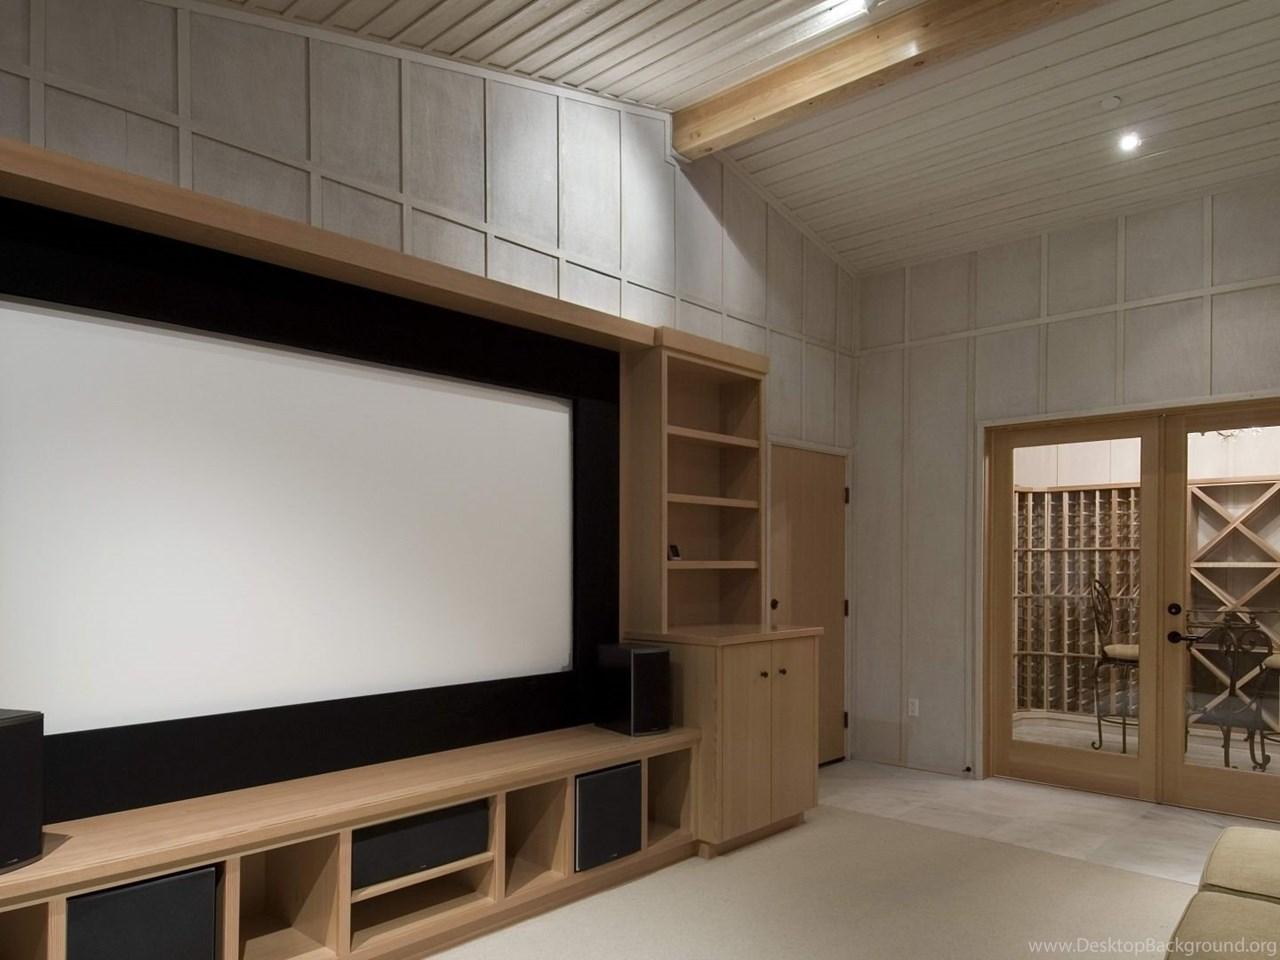 Full Hd 1080p Home Theater Wallpapers Hd Desktop Backgrounds Desktop Background